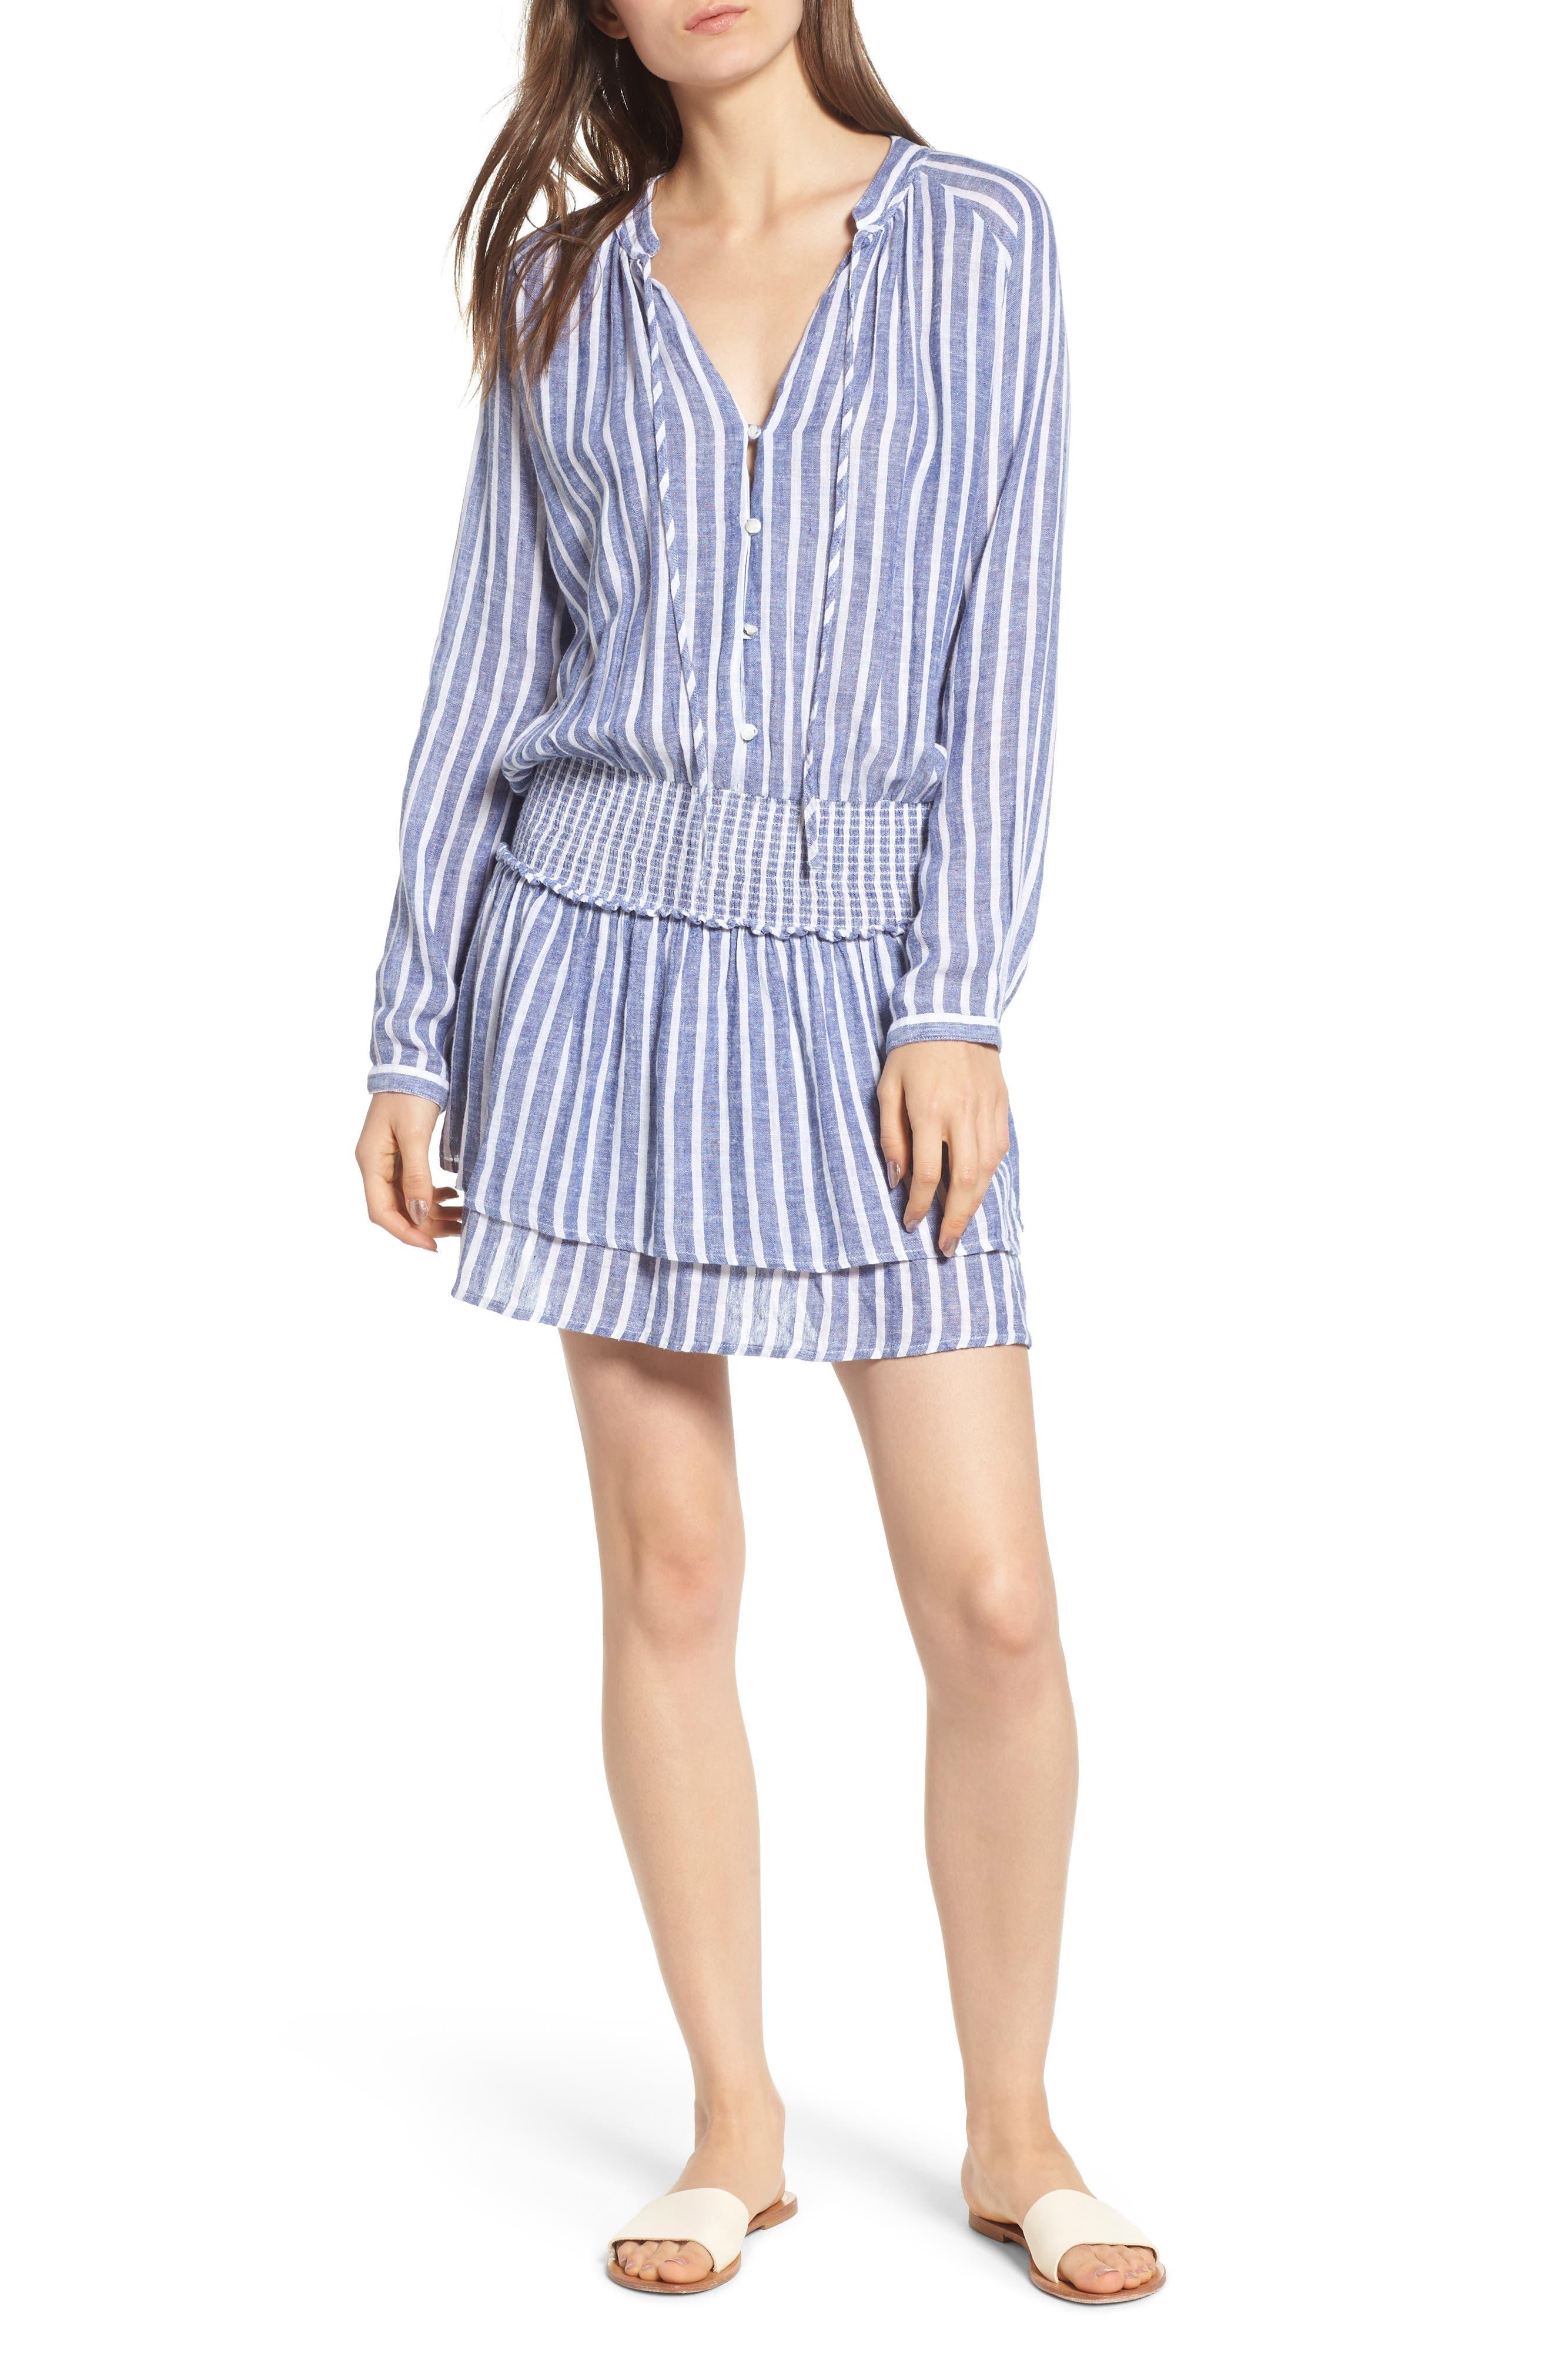 Jasmine Long-Sleeve Tie-Neck Smocked-Waist Striped Linen-Blend Mini Dress in Parisian Blue